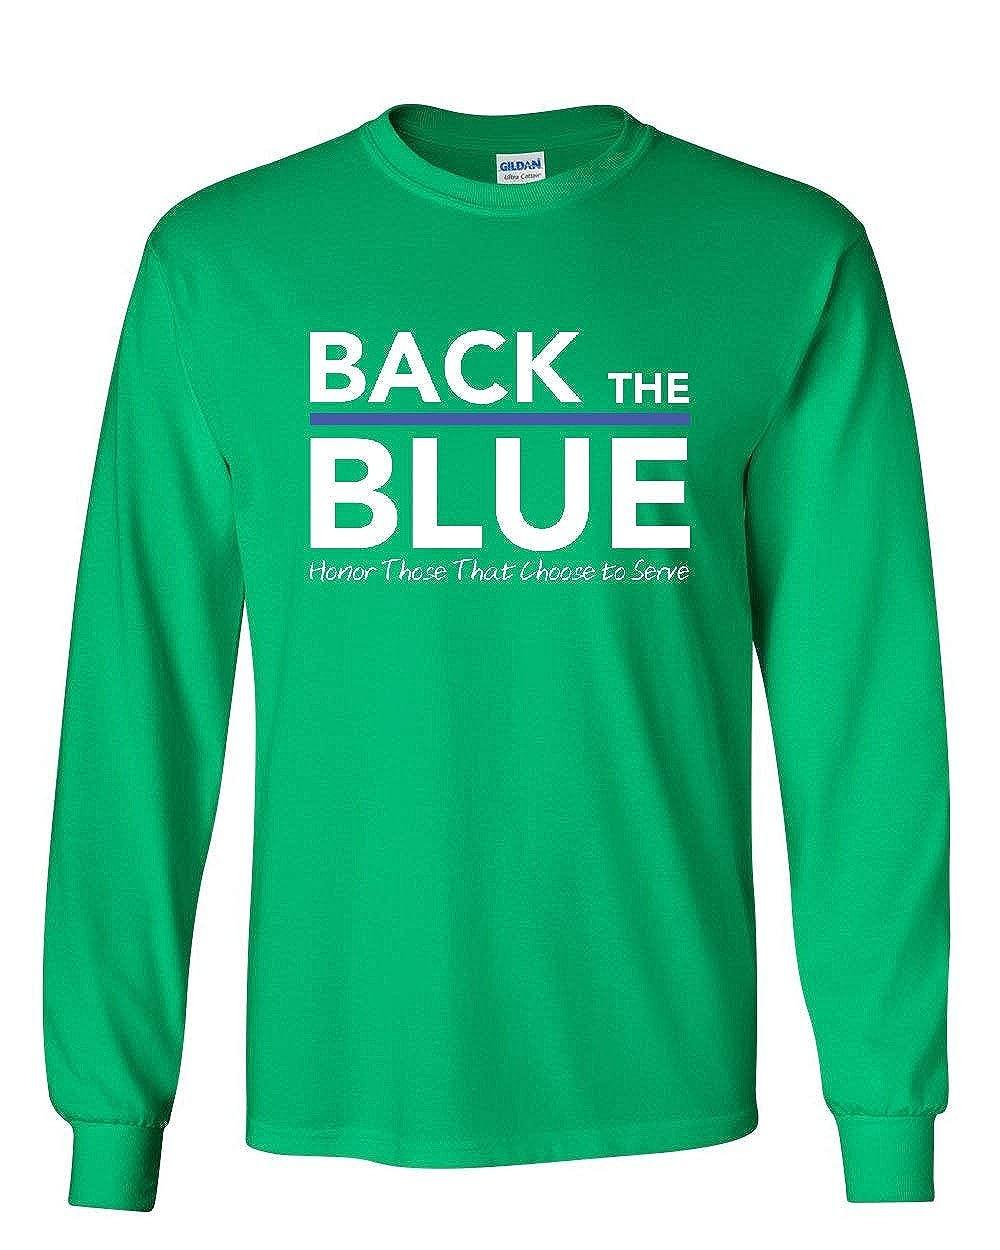 Back The Blue Long Sleeve T-Shirt Thin Blue Line Honor Police Heroic Service Tee